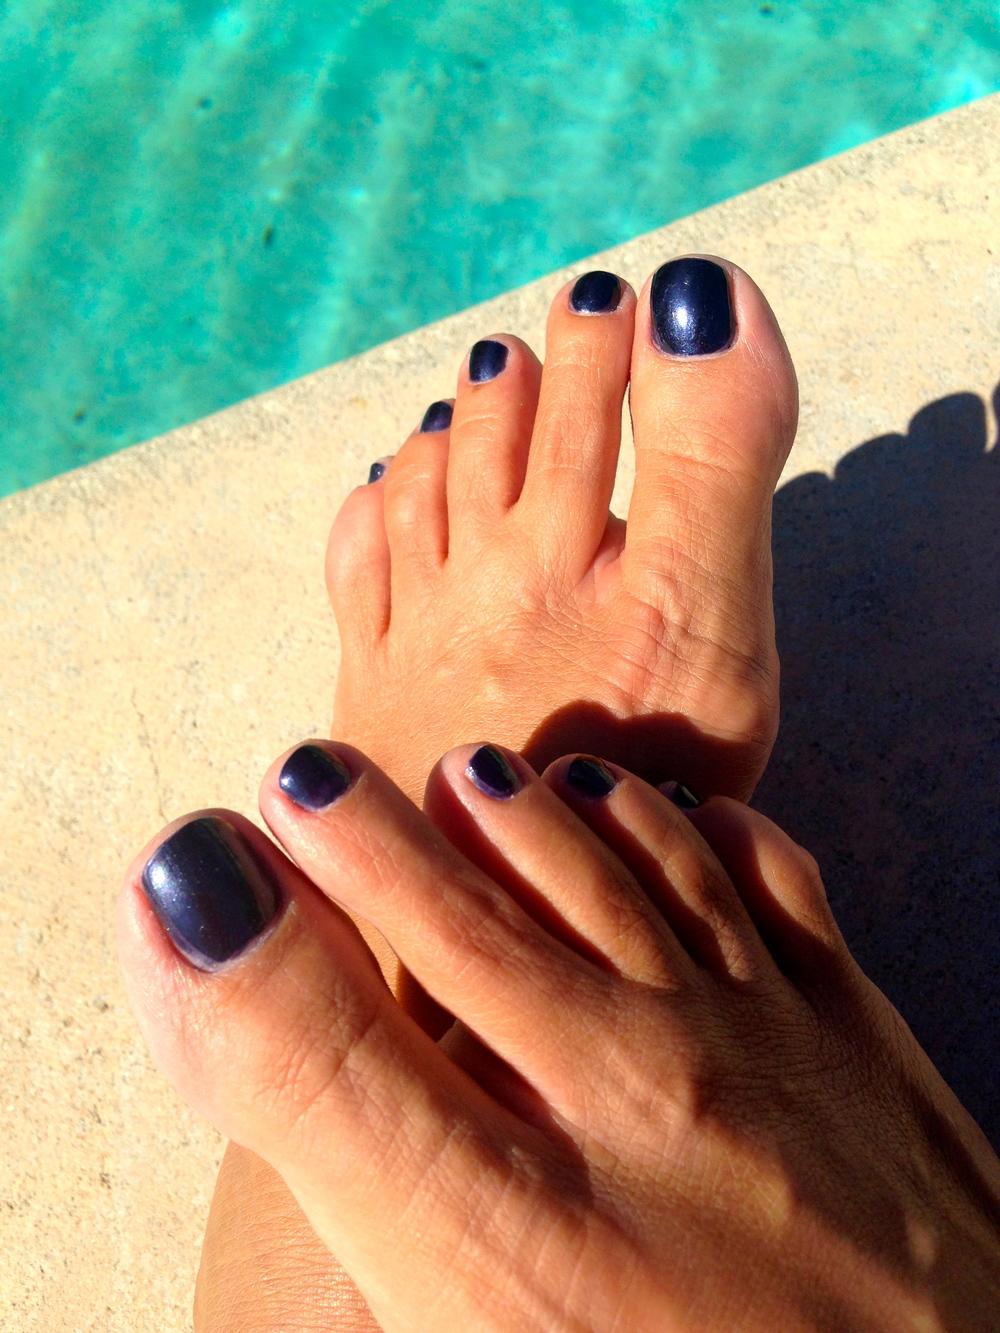 I love côteshadeNo. 76 (midnight blue) on the toes!